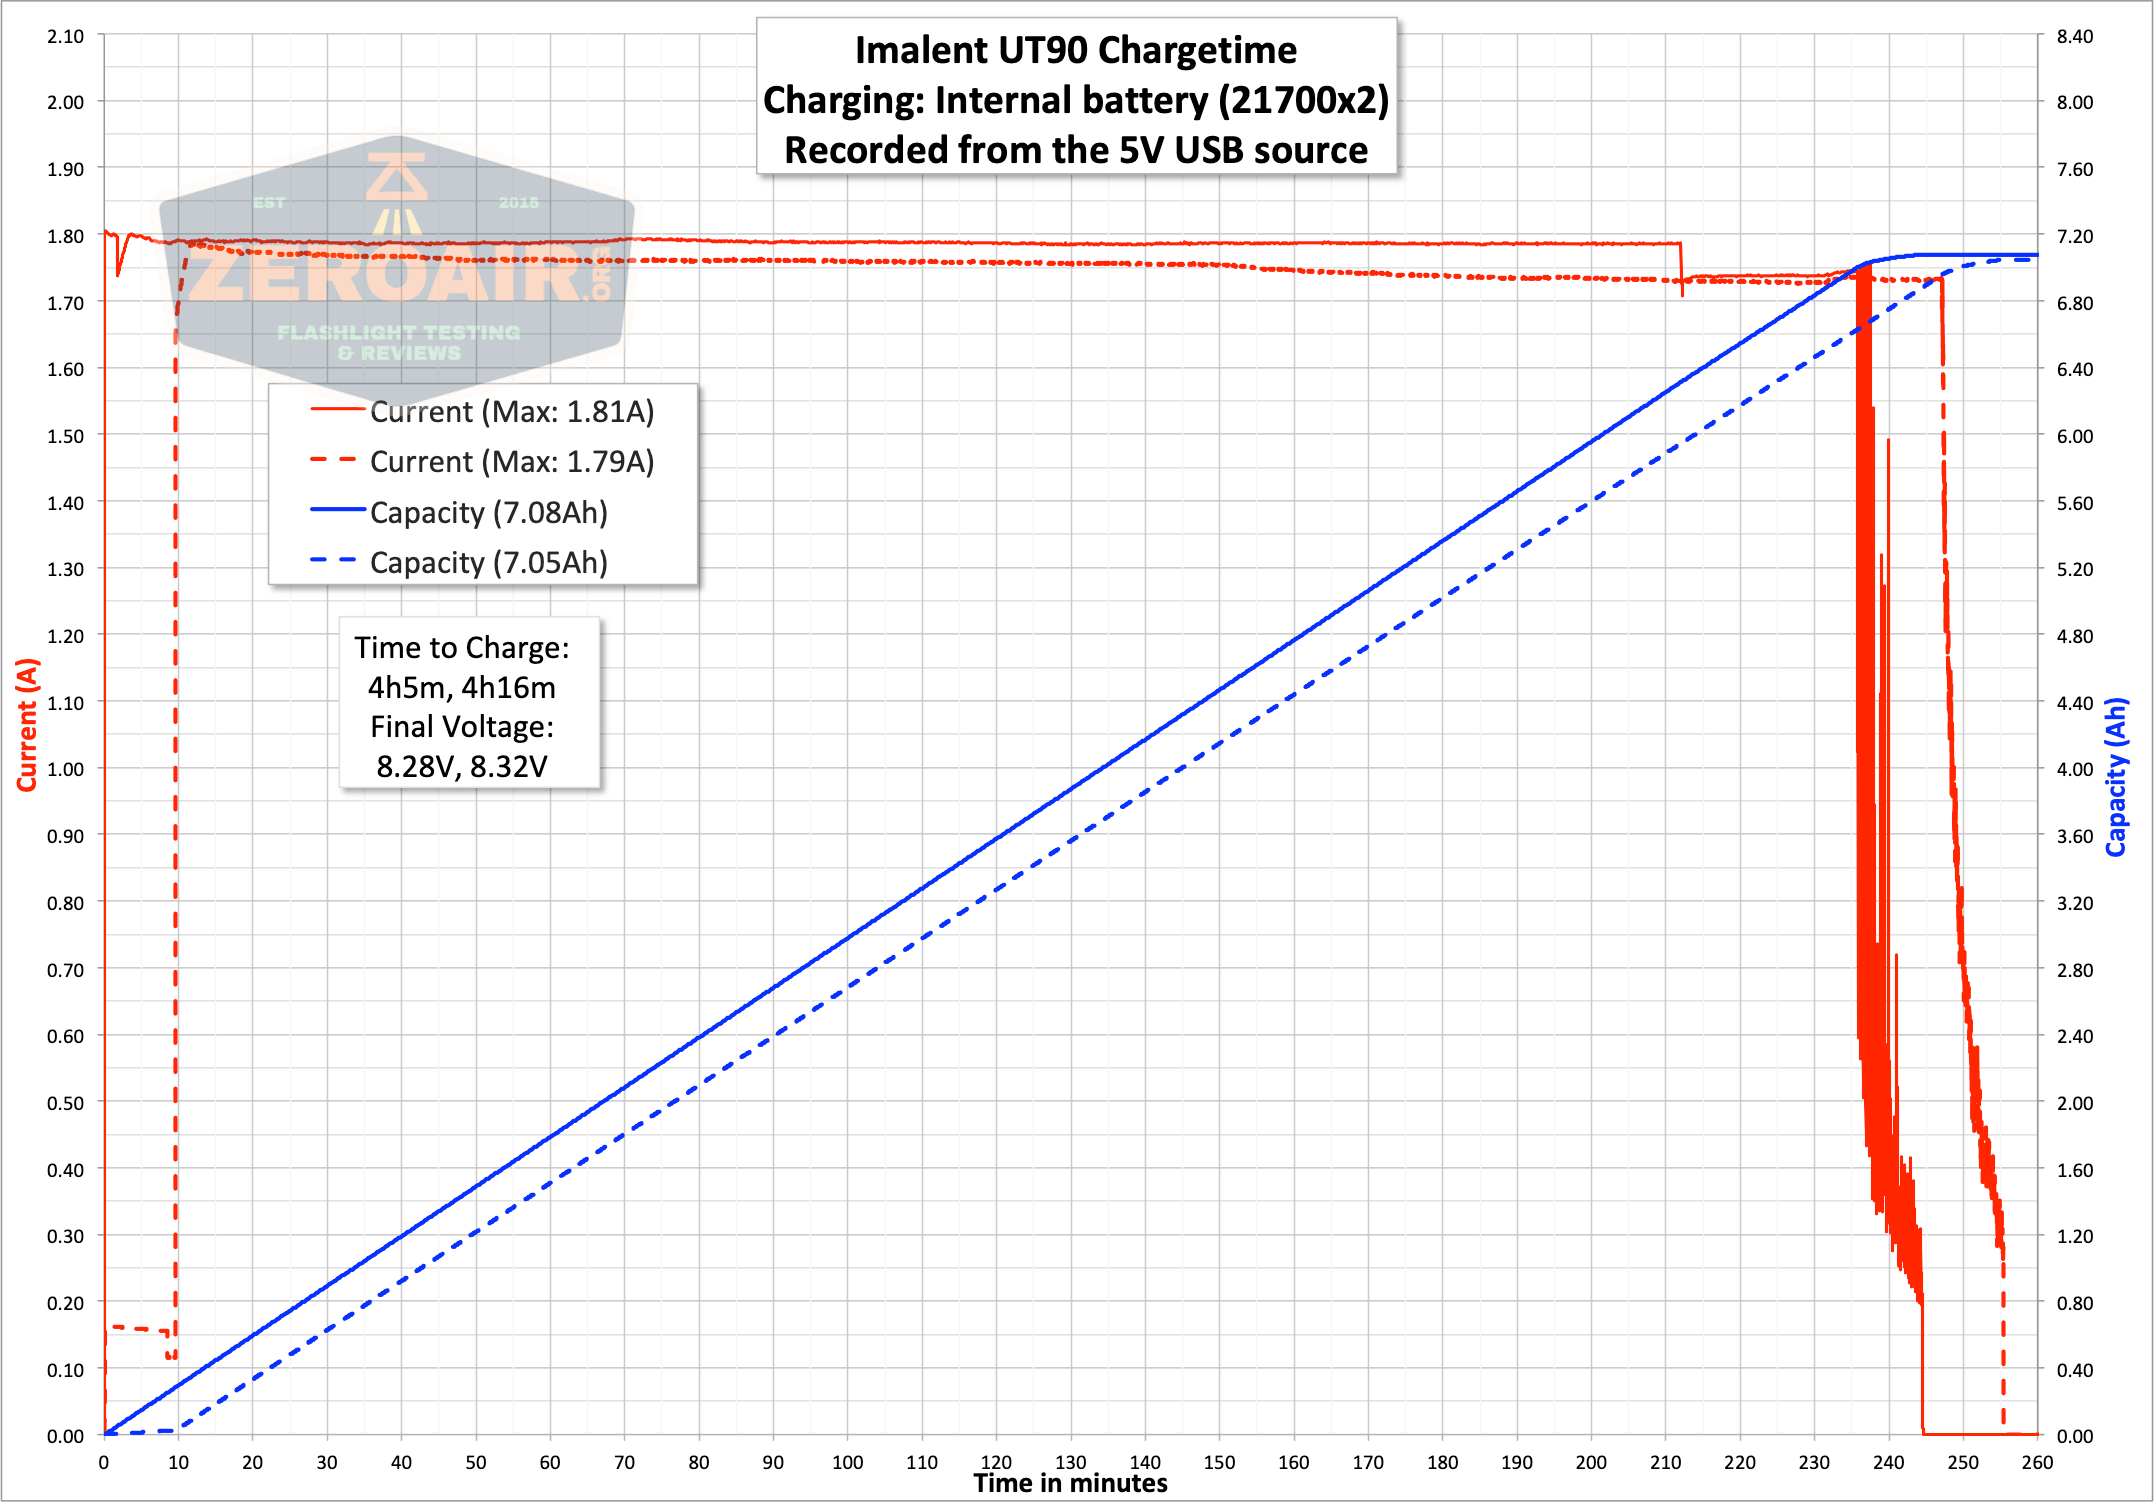 imalent ut90 charge graph